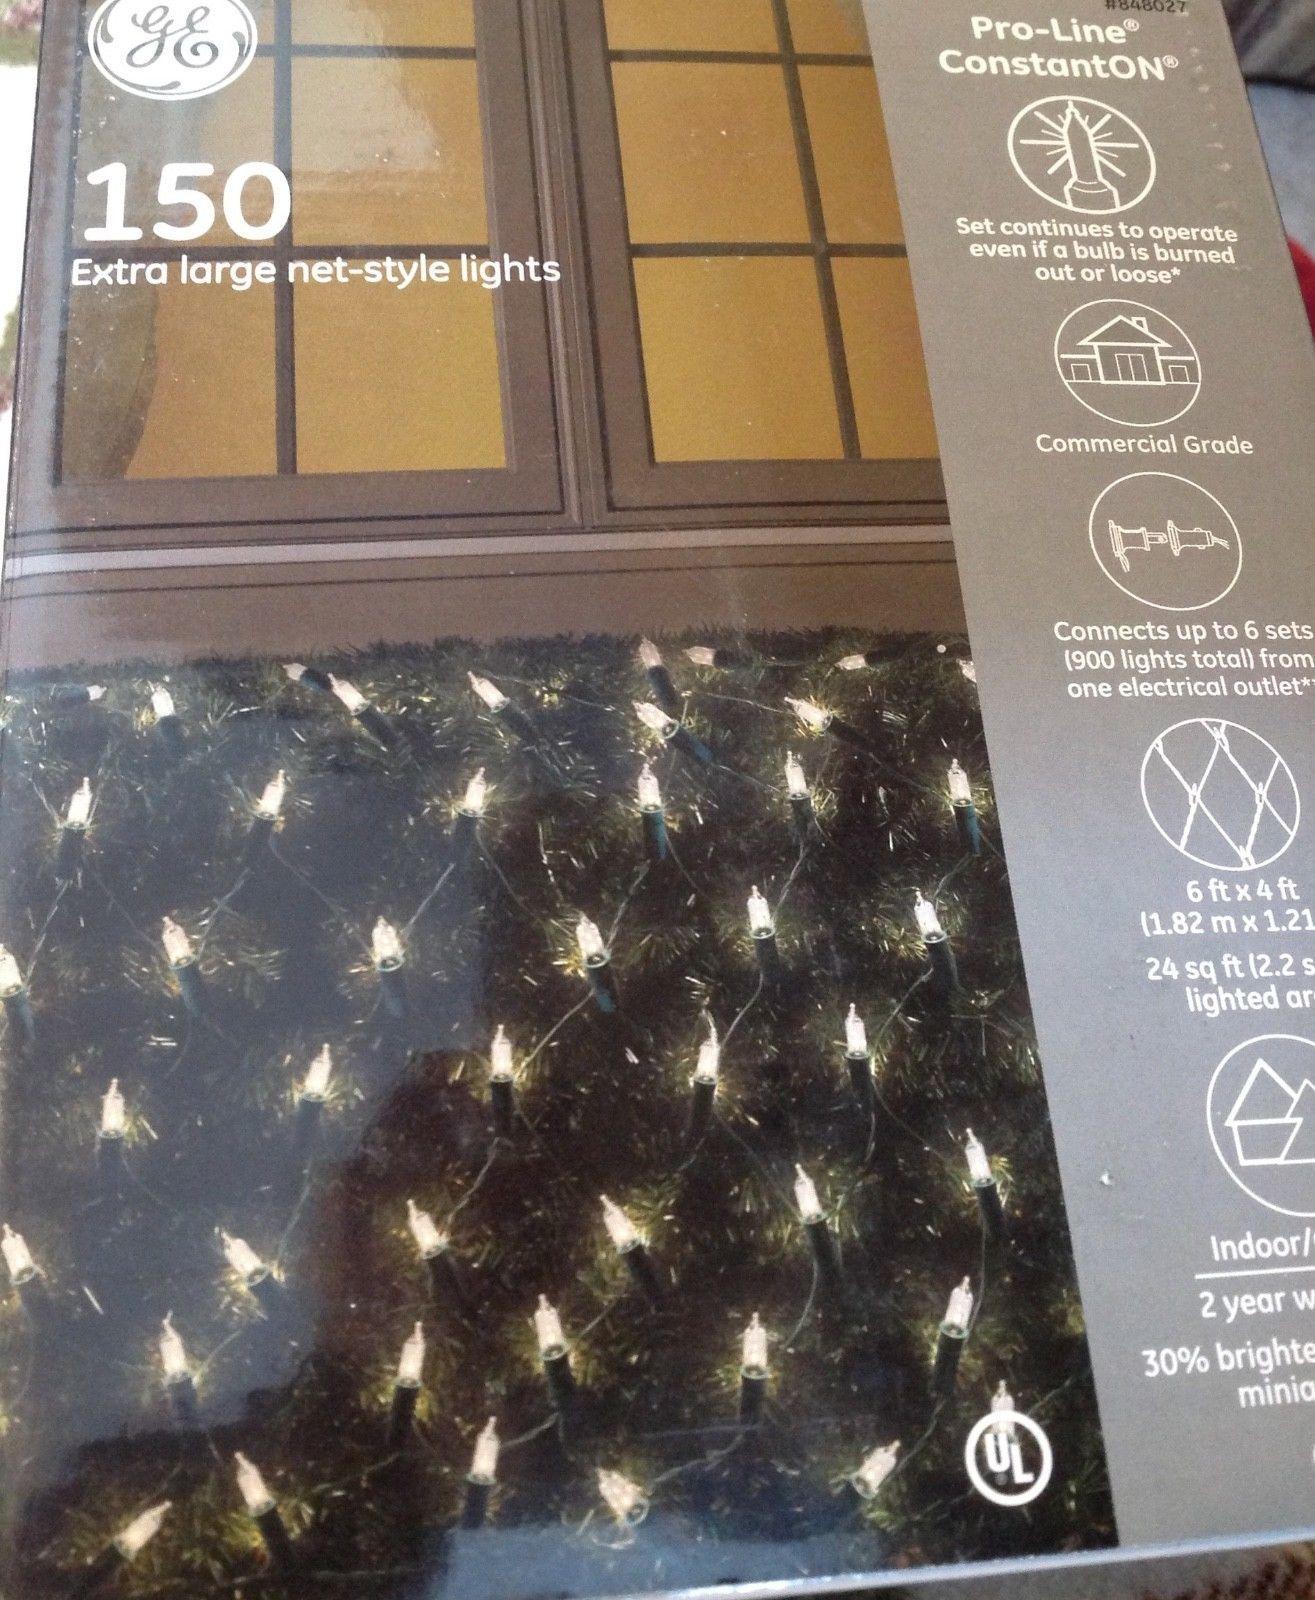 Christmas Lights 150 Extra Large Net Lights Indoor Outdoor Ge